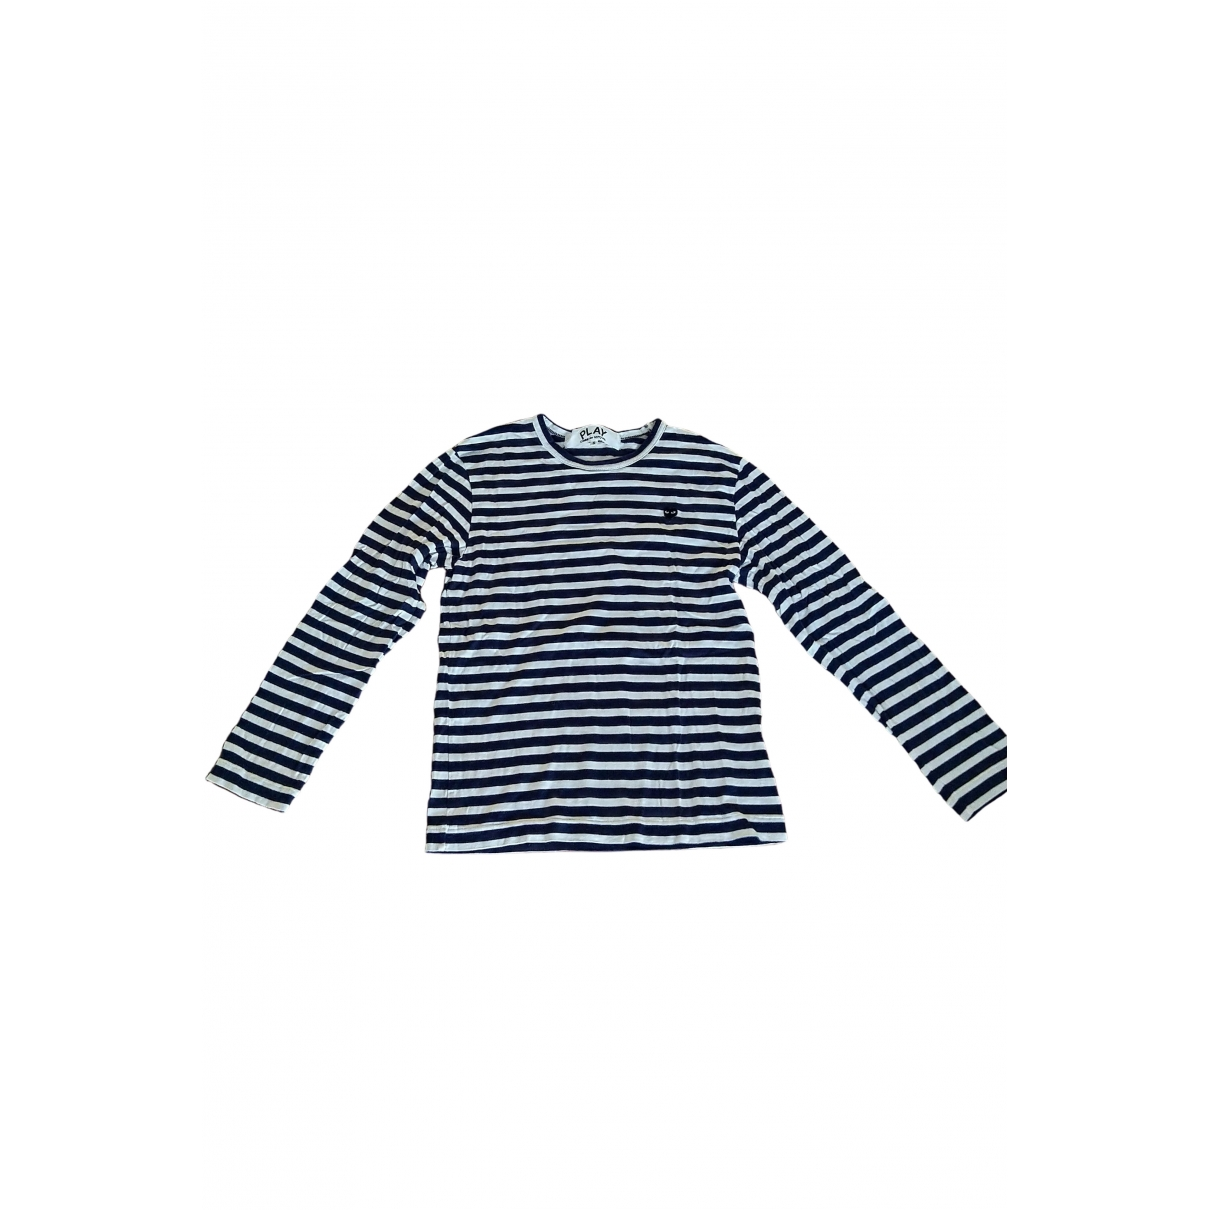 Comme Des Garcons \N Blue Cotton Knitwear for Women S International